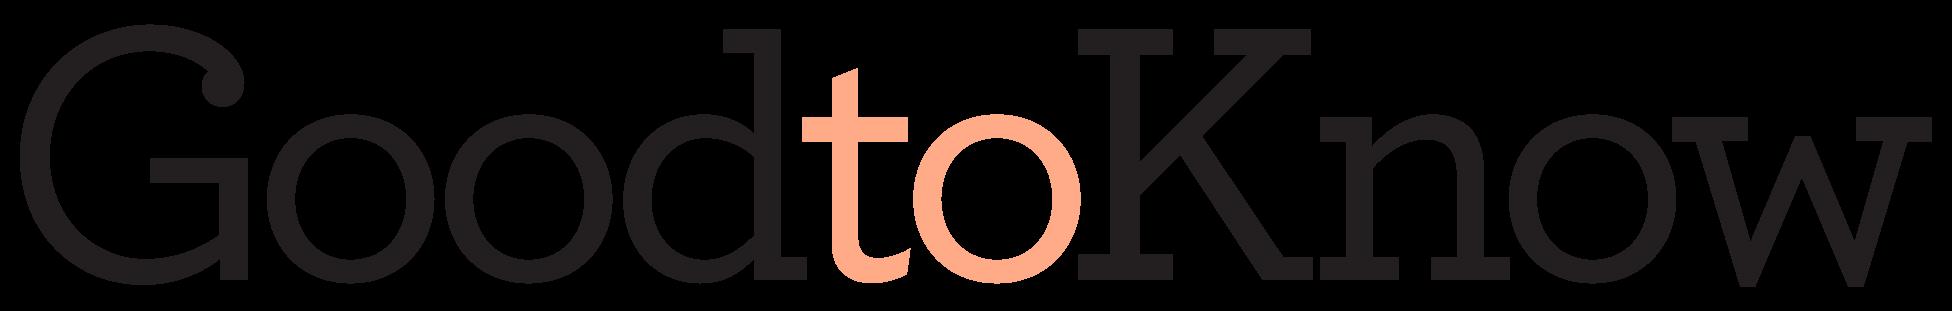 goodtoknow.co.uk Logo